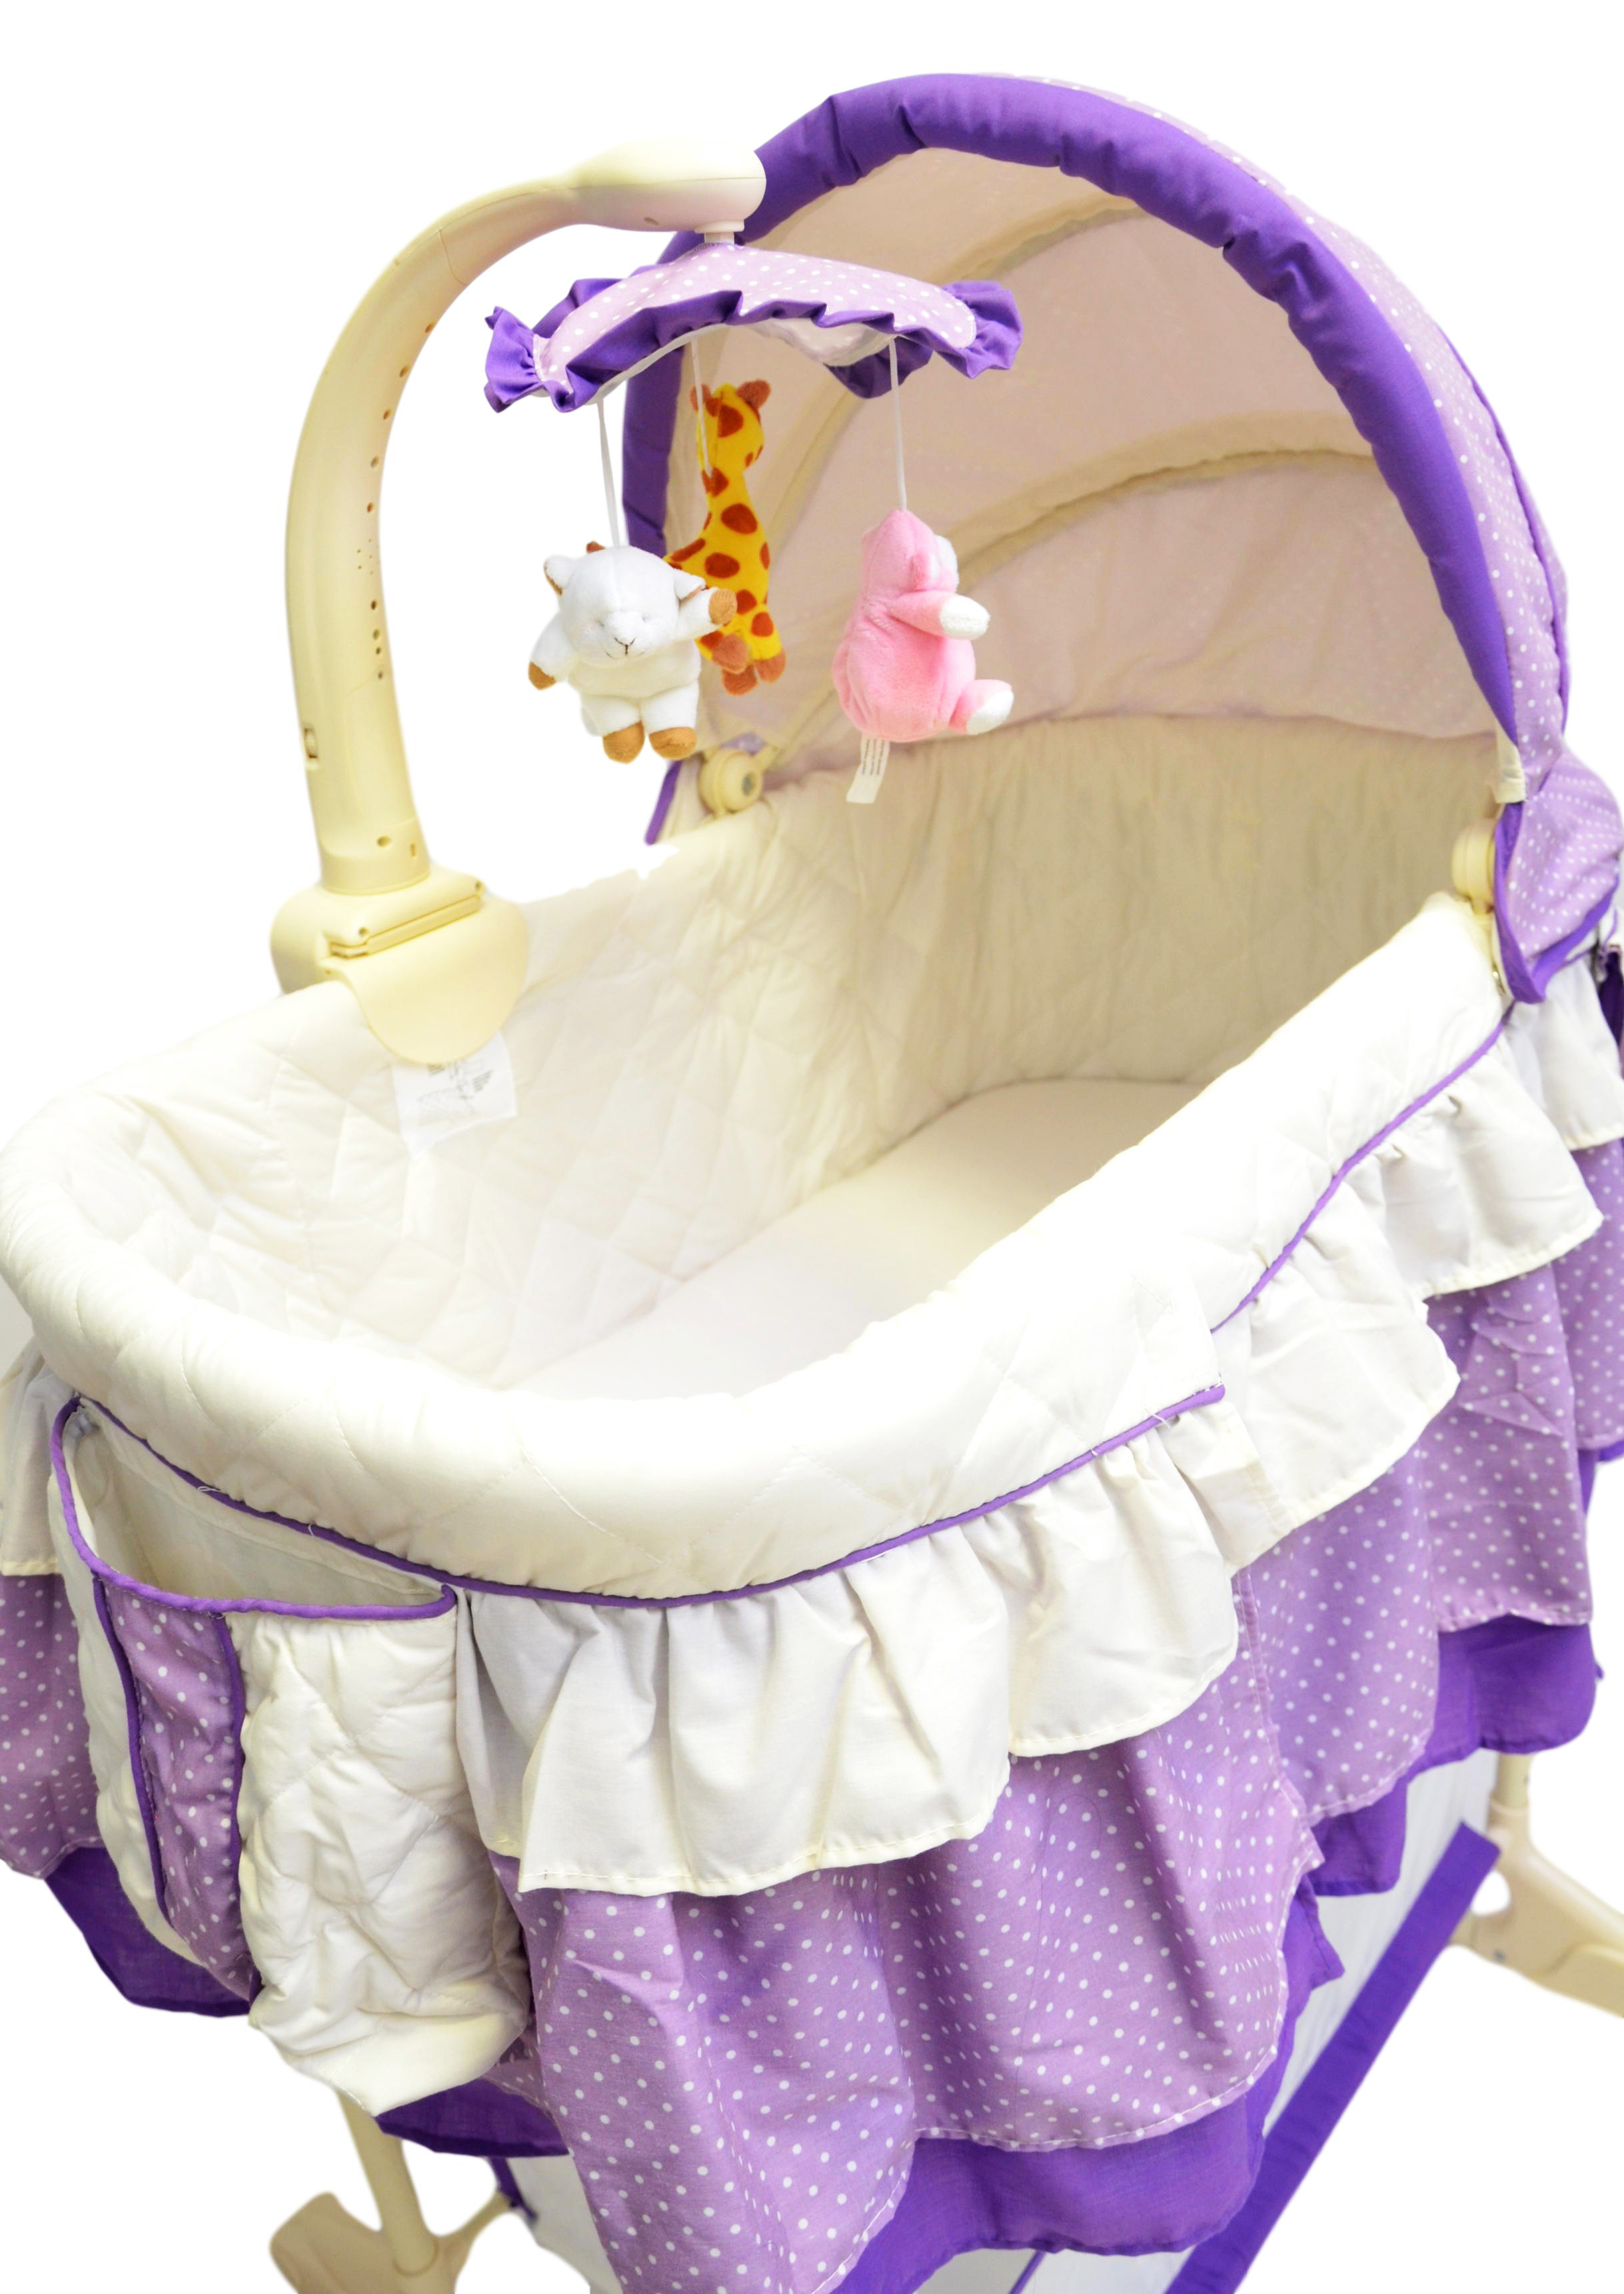 best for kids stubenwagen babywiege babybett babyschaukel violett ebay. Black Bedroom Furniture Sets. Home Design Ideas